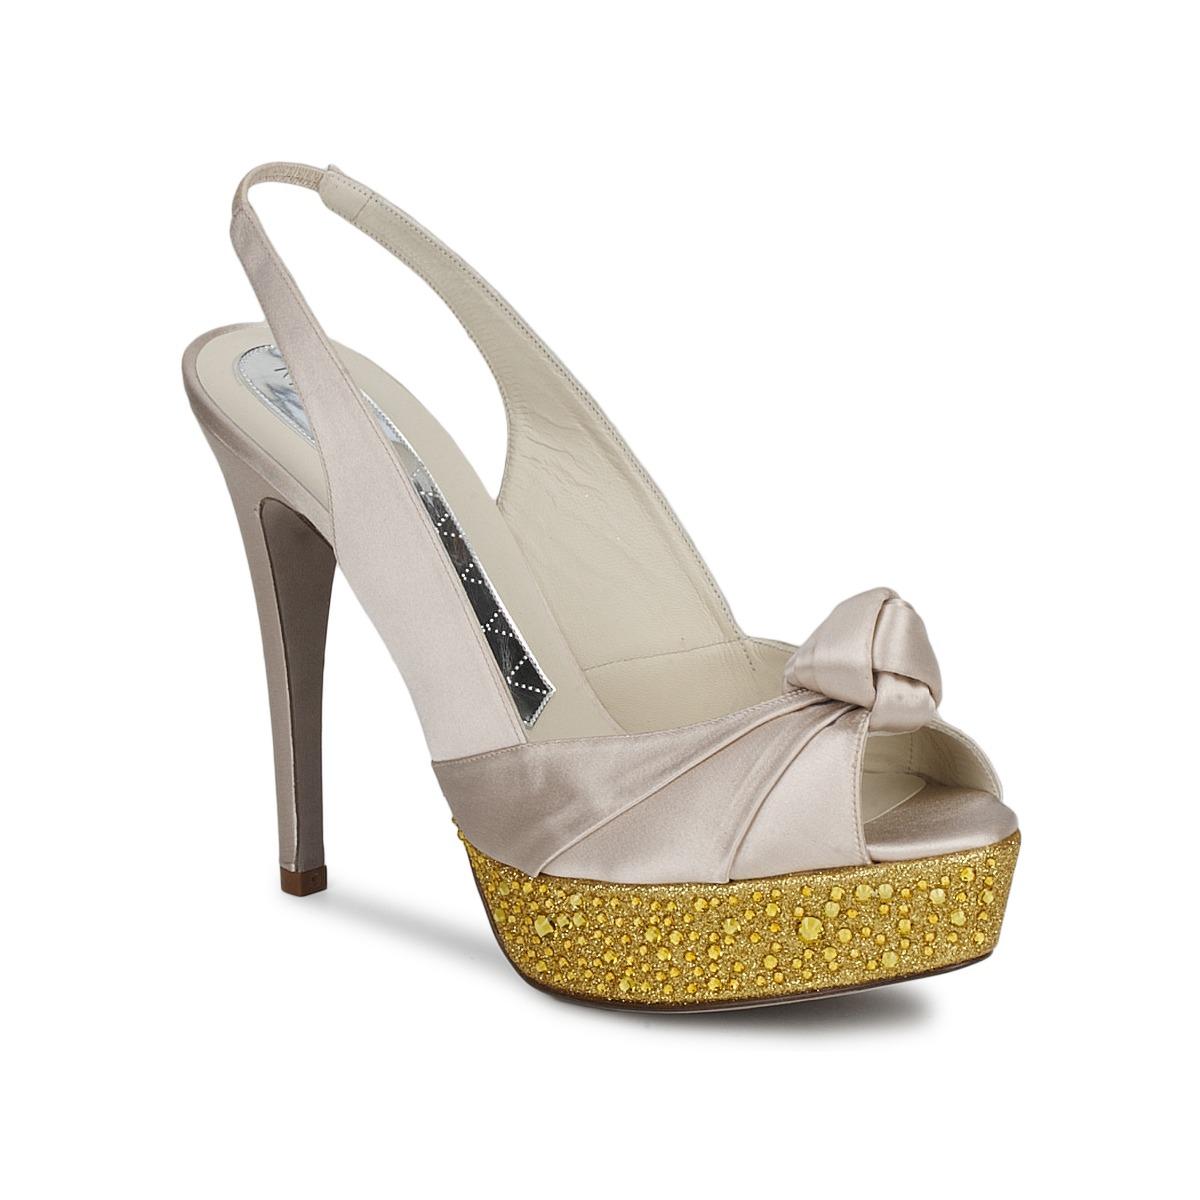 Magrit IMPERIALI Weiss / Goldfarben - Kostenloser Versand bei Spartoode ! - Schuhe Sandalen / Sandaletten Damen 154,50 €